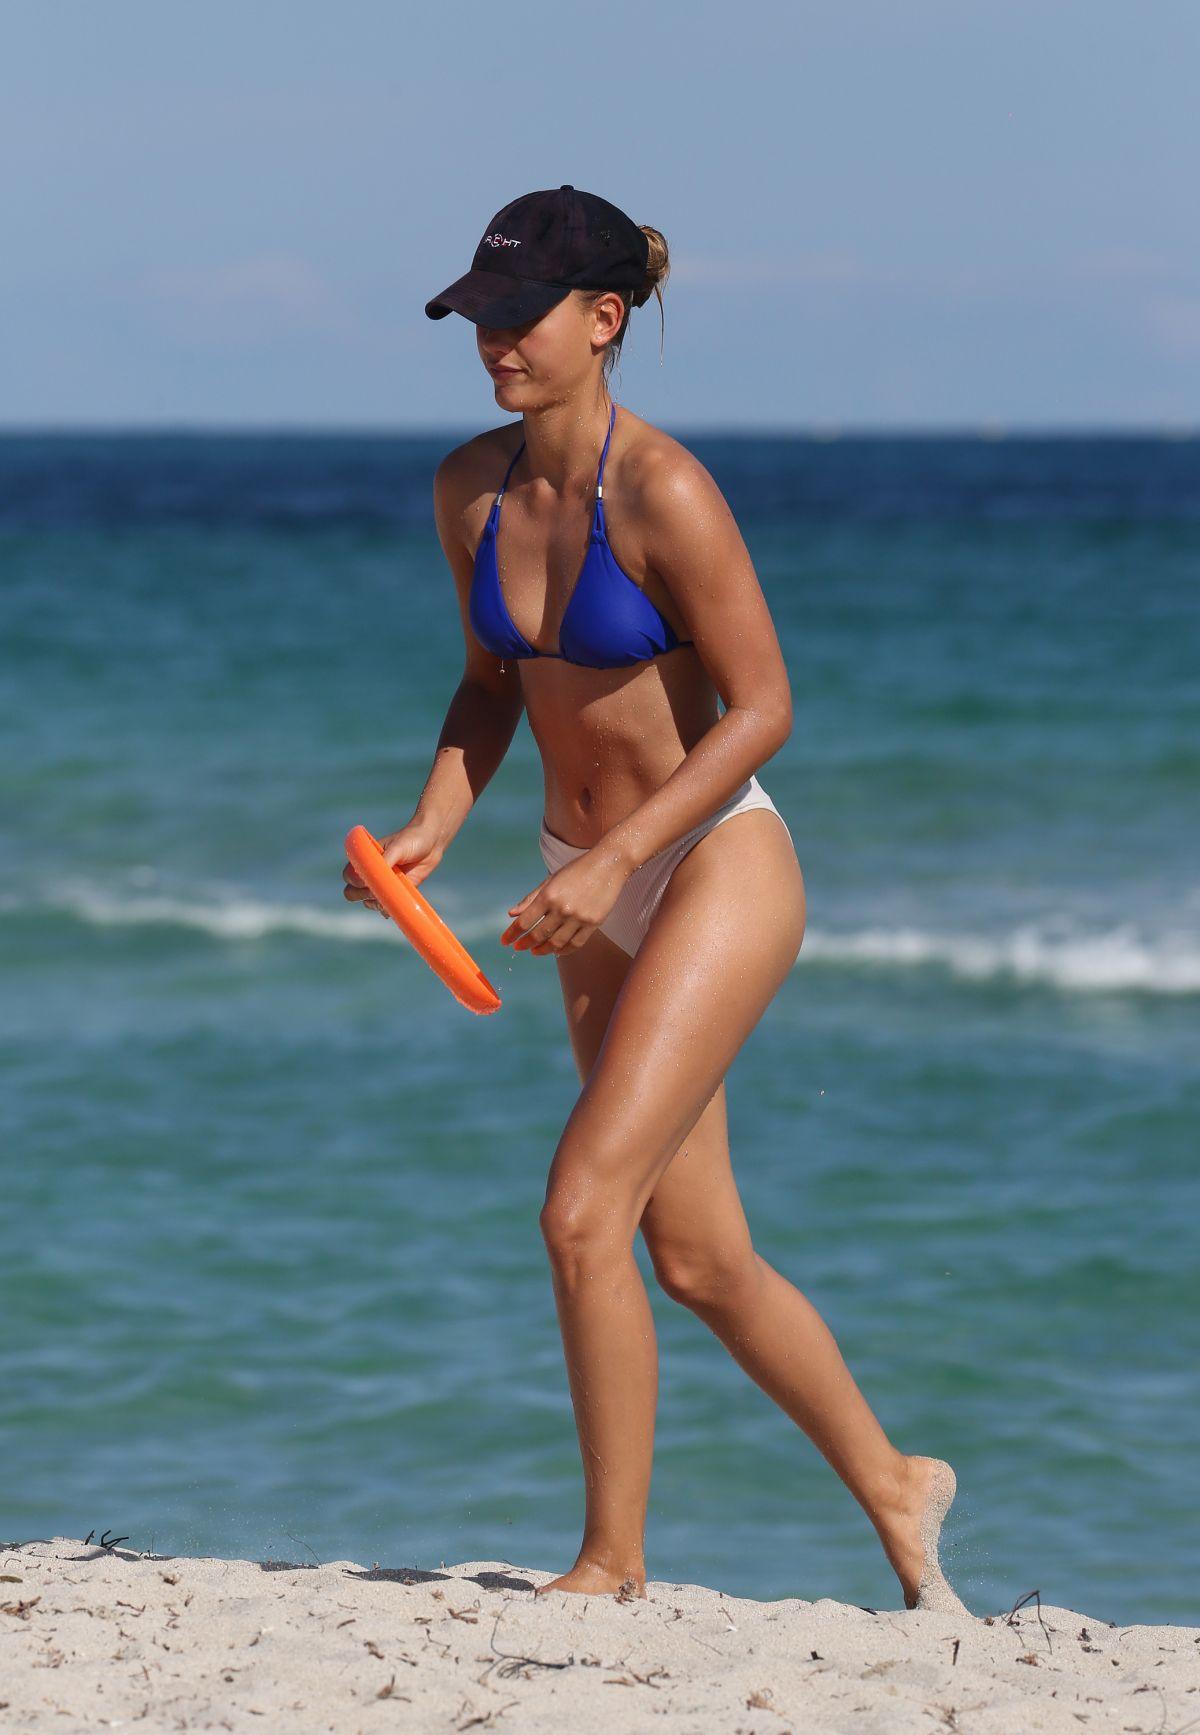 Chase Carter in Bikini at the beach in Miami Pic 2 of 35